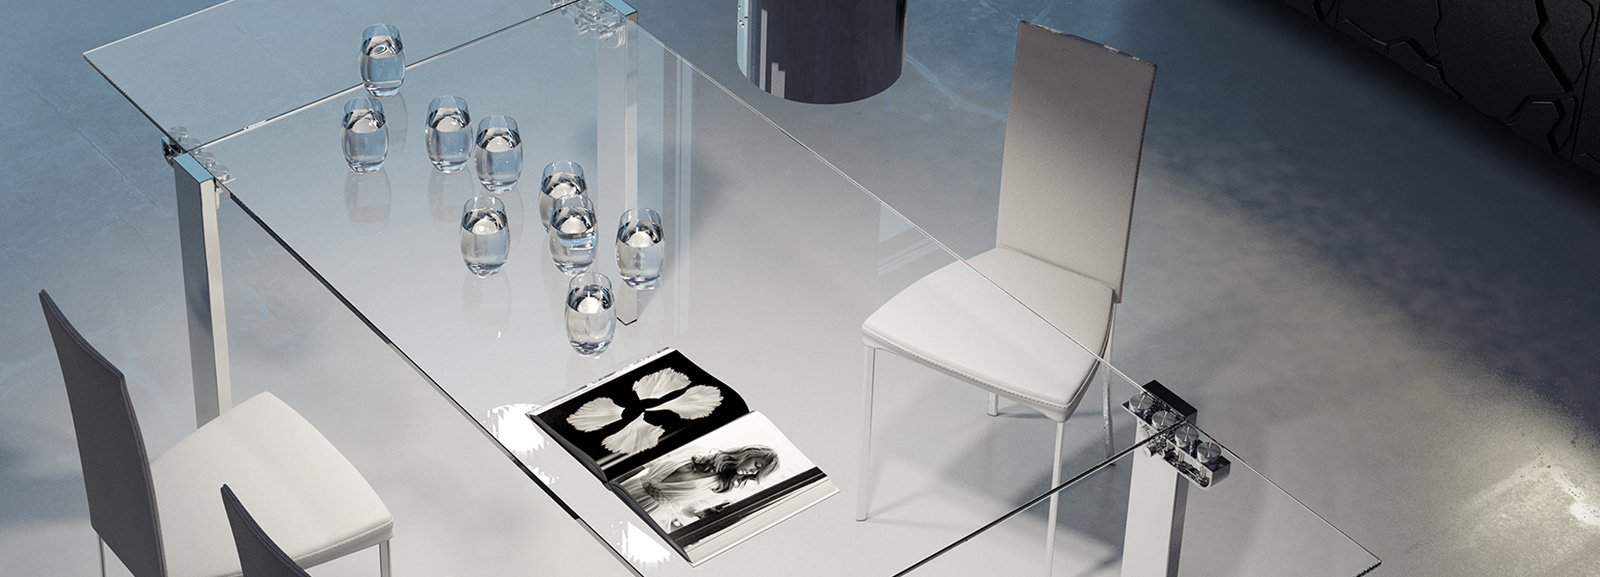 Evi riflessi tavoli allungabili cose di casa for Riflessi tavoli allungabili